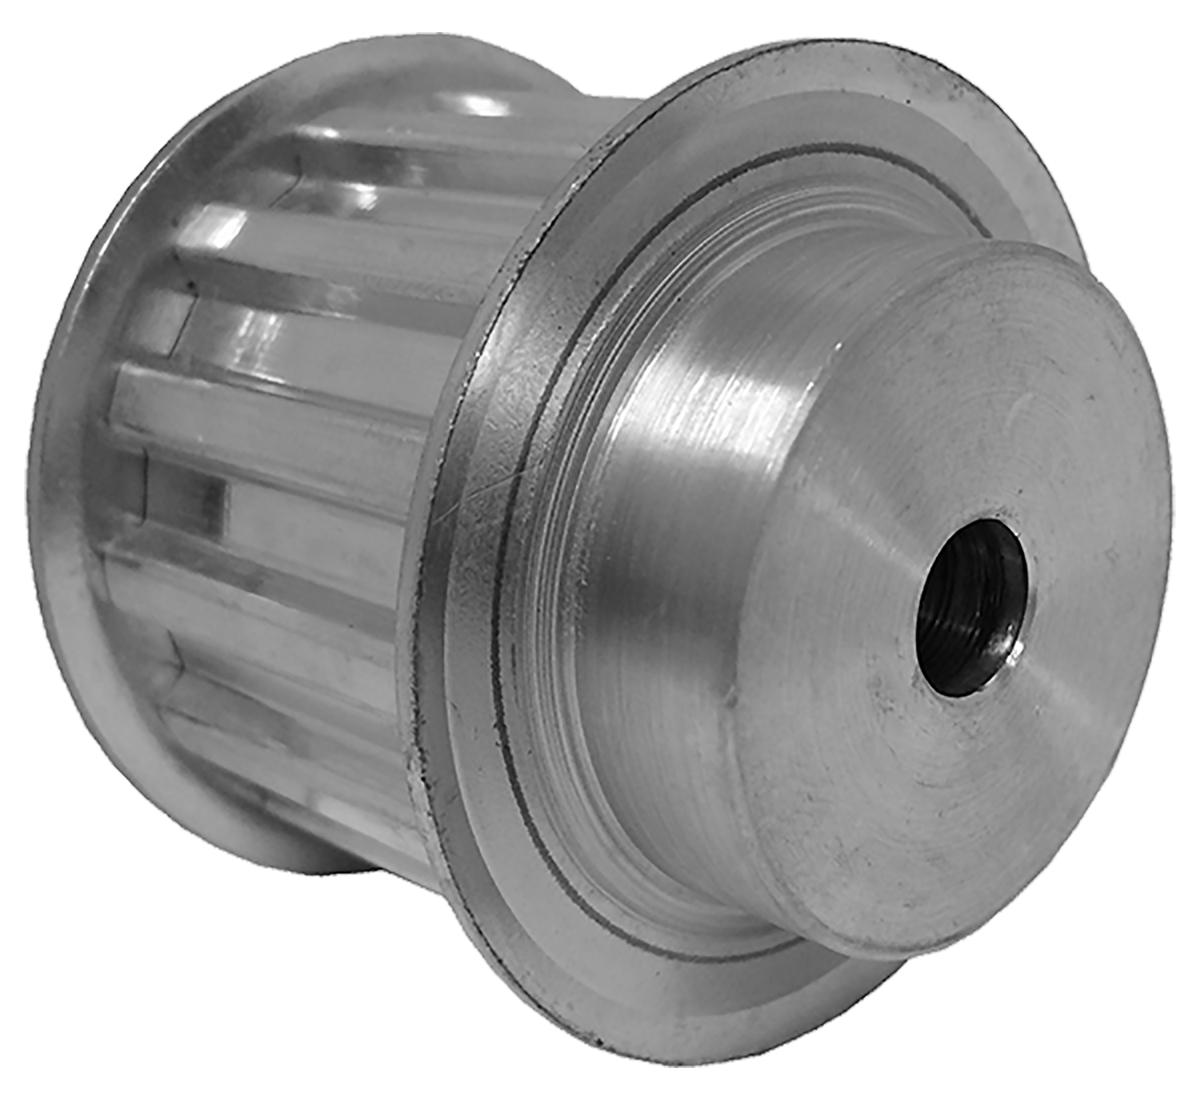 40T10/14-2 - Aluminum Metric Pulleys